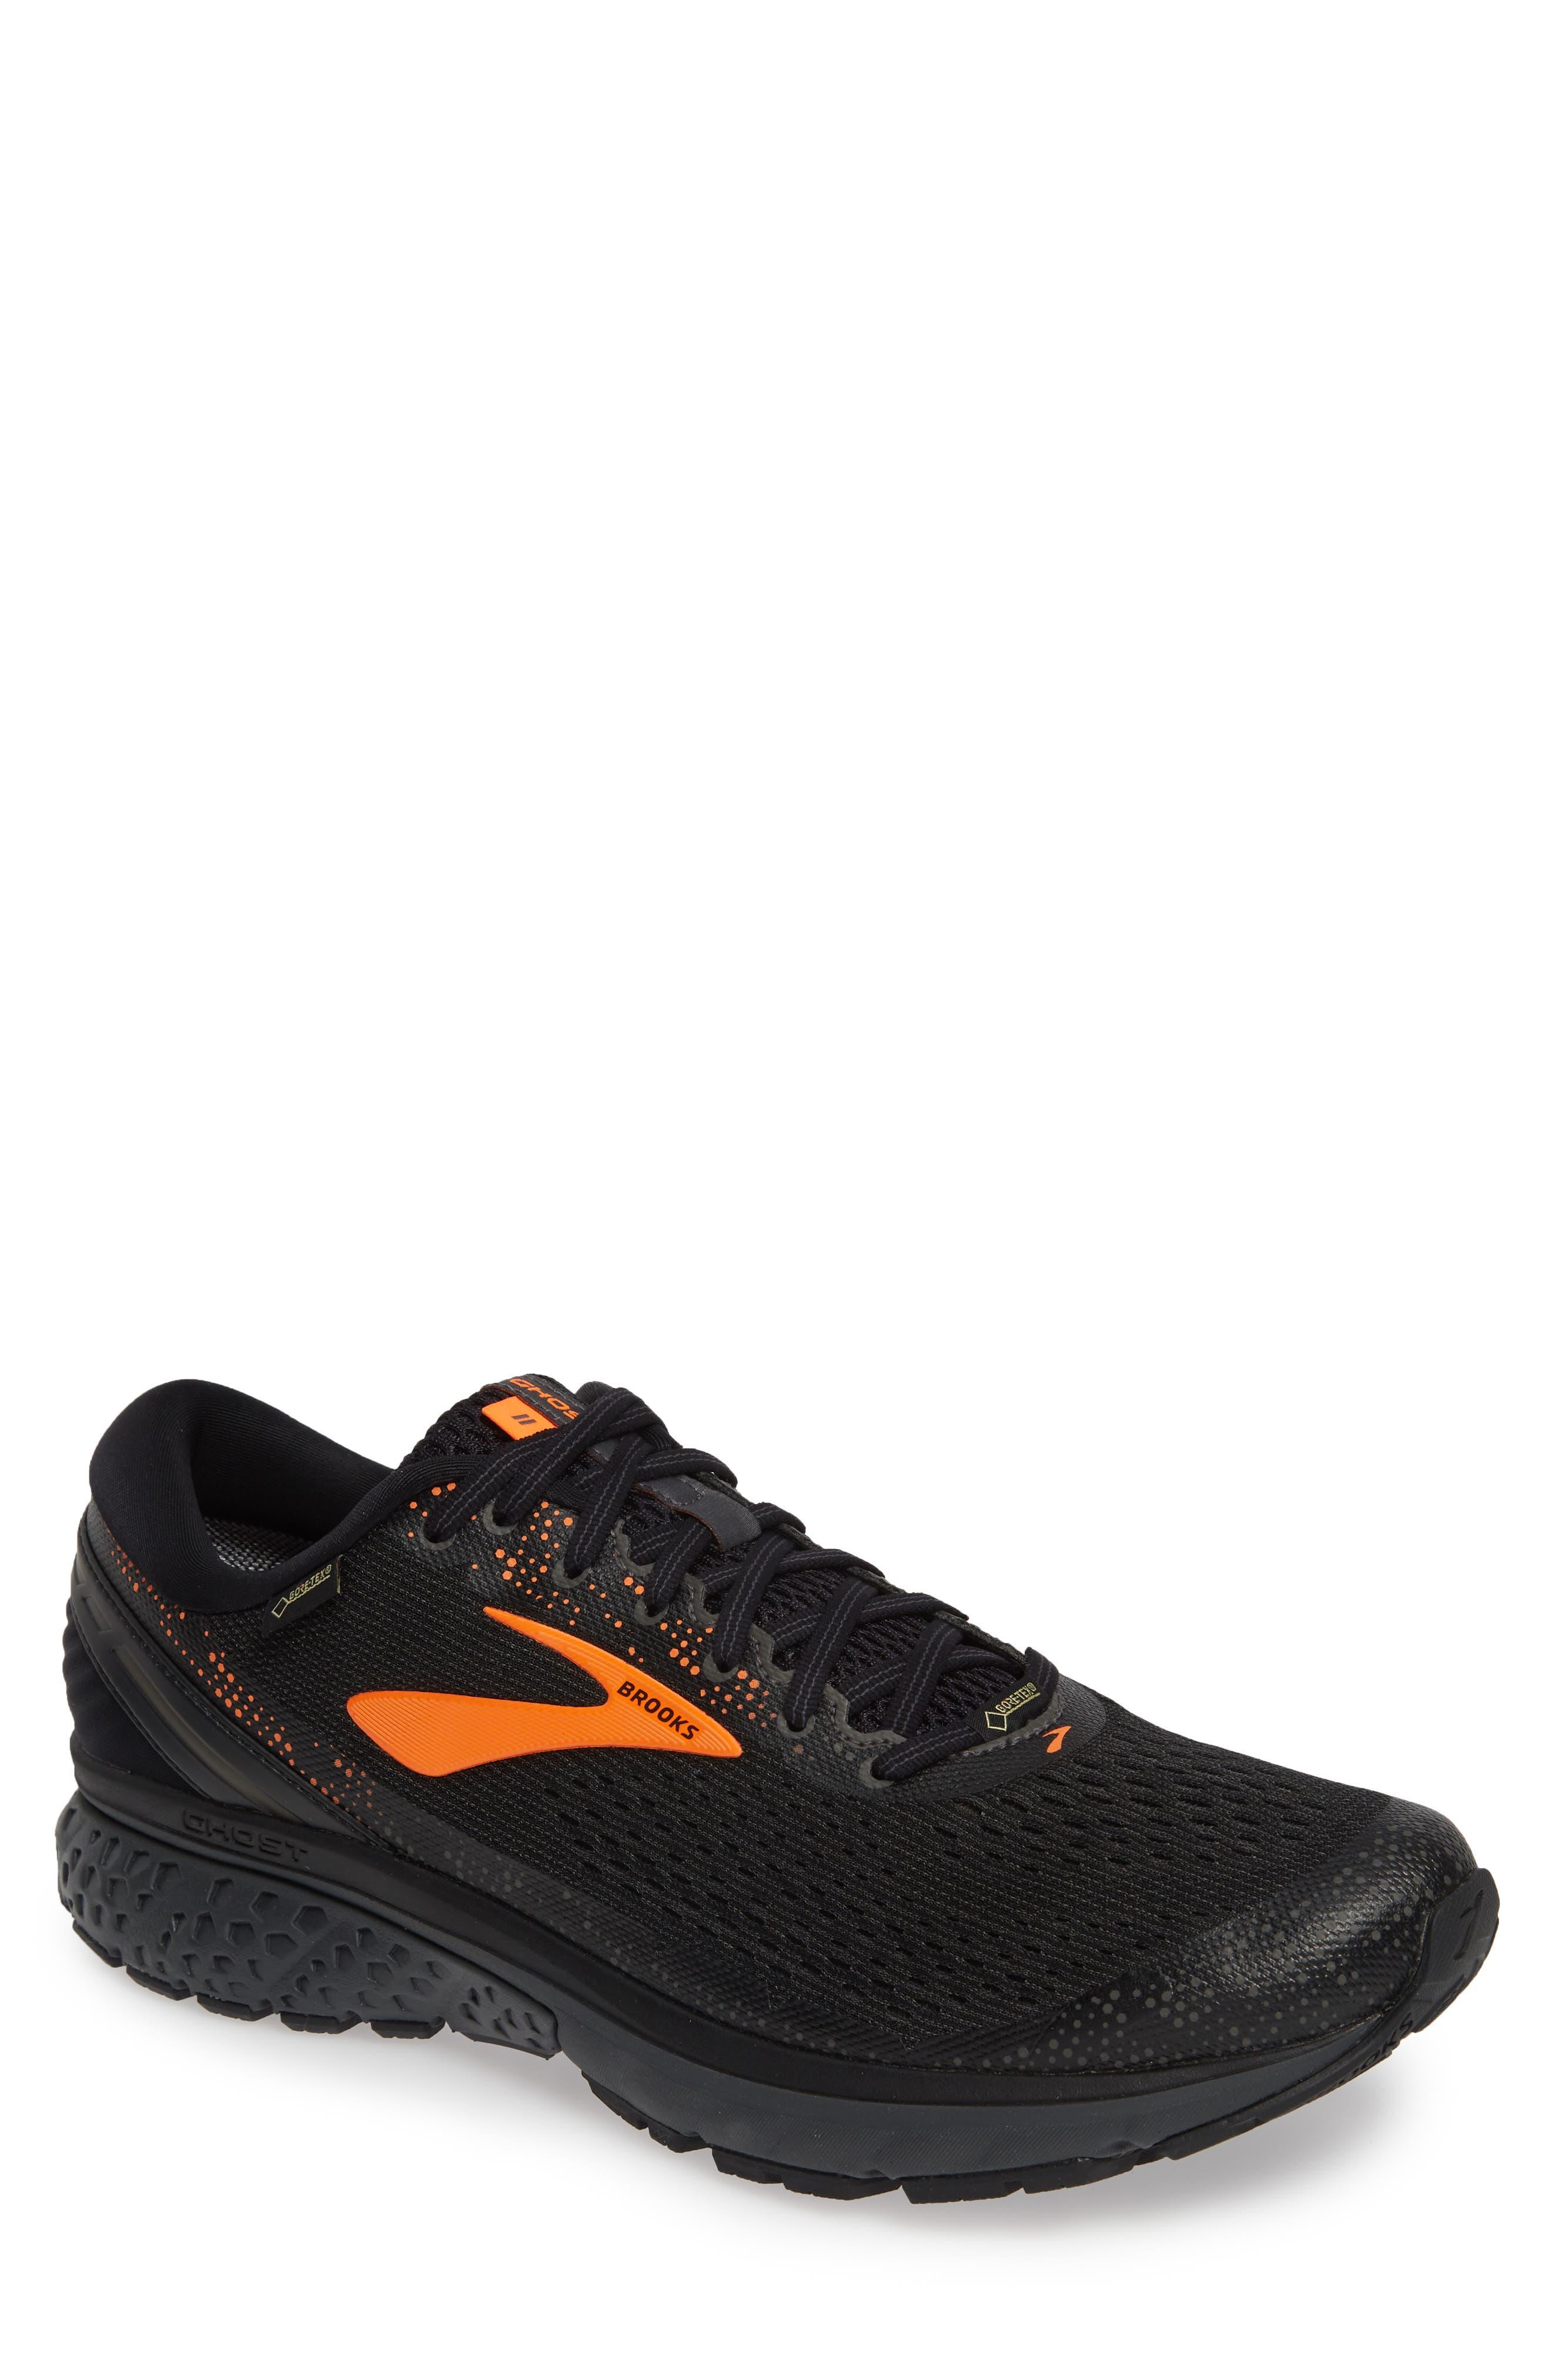 Brooks Ghost 11 Gtx Gore-Tex Waterproof Running Shoe, Black